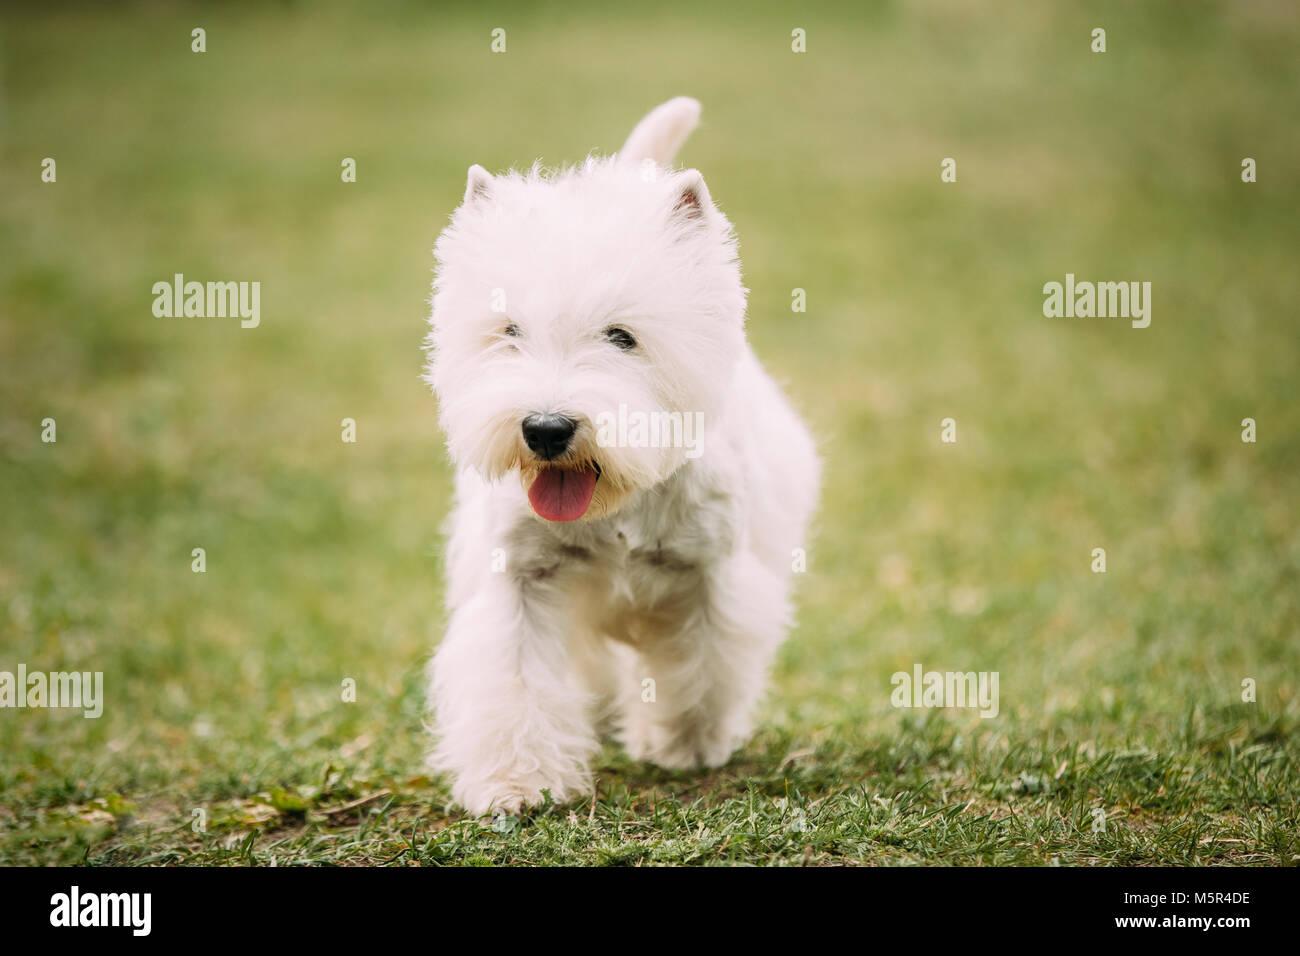 Small West Highland White Terrier - Westie, Westy Dog Running On ...